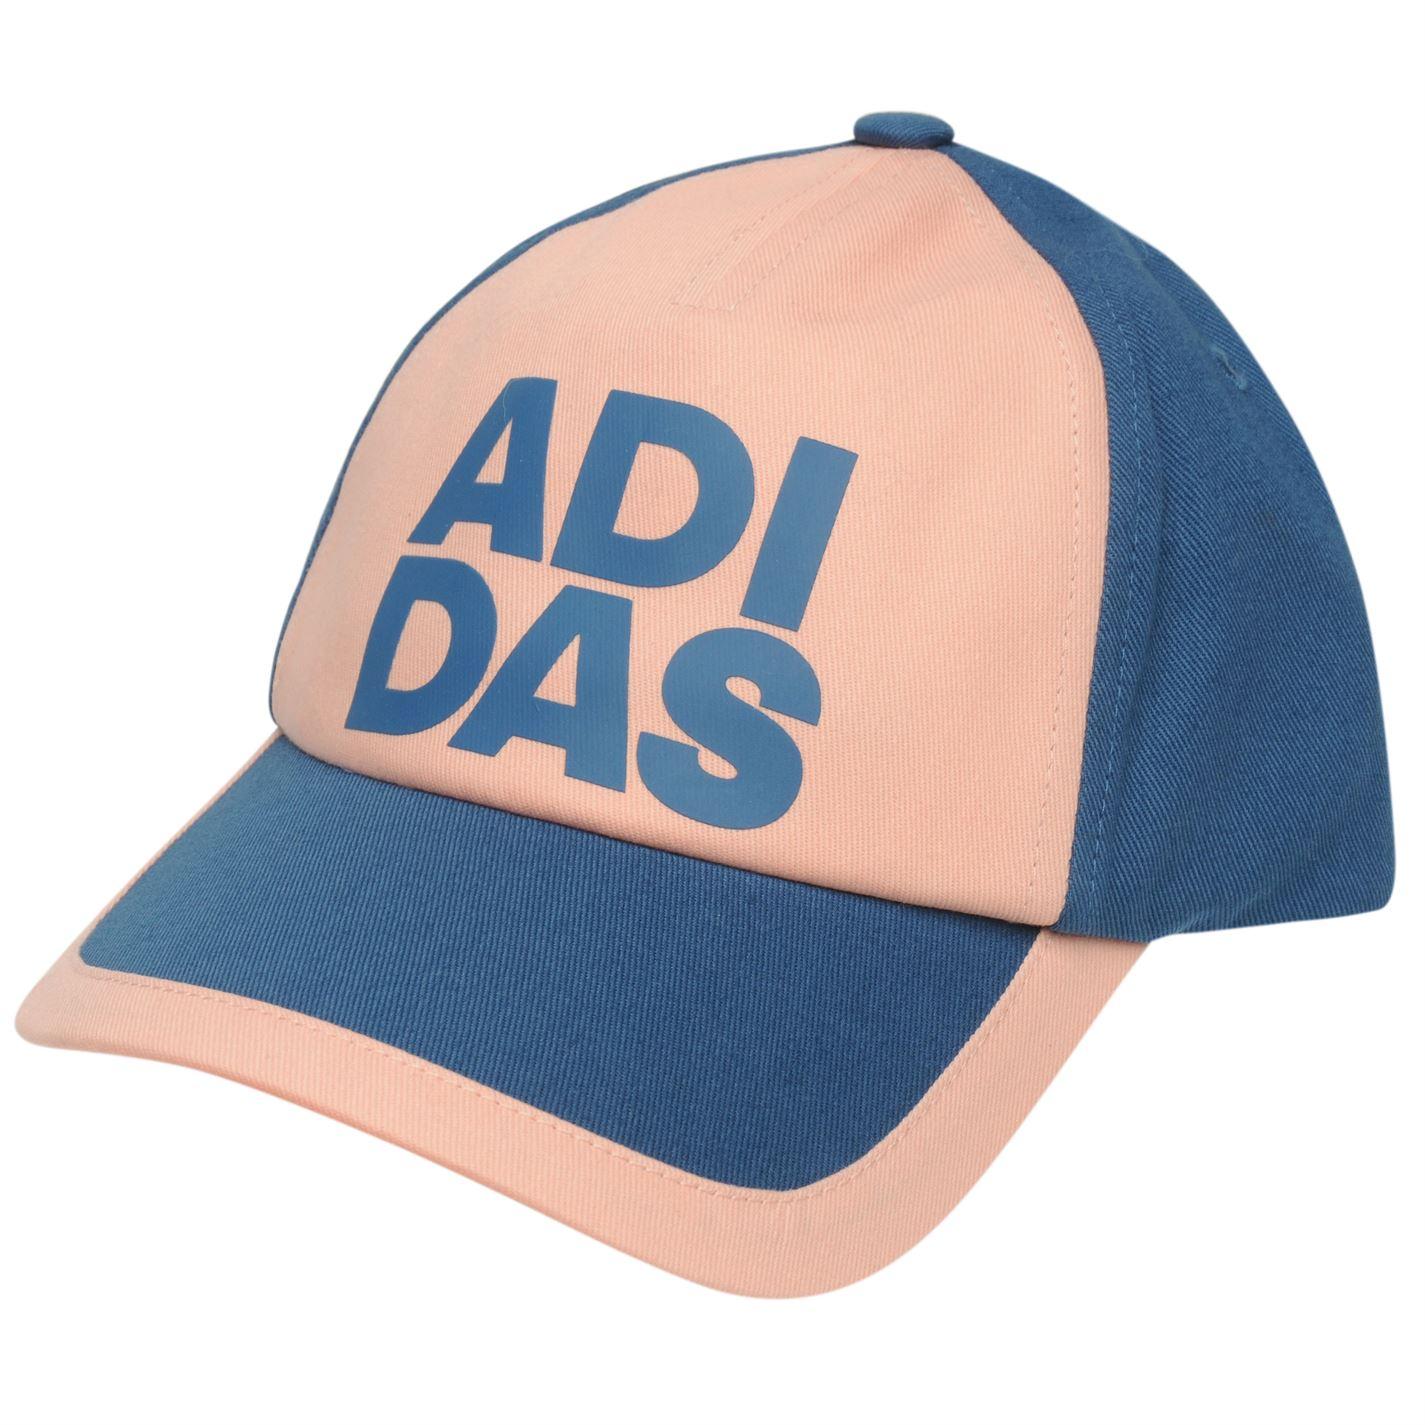 Adidas LK Graphic Cap Girls